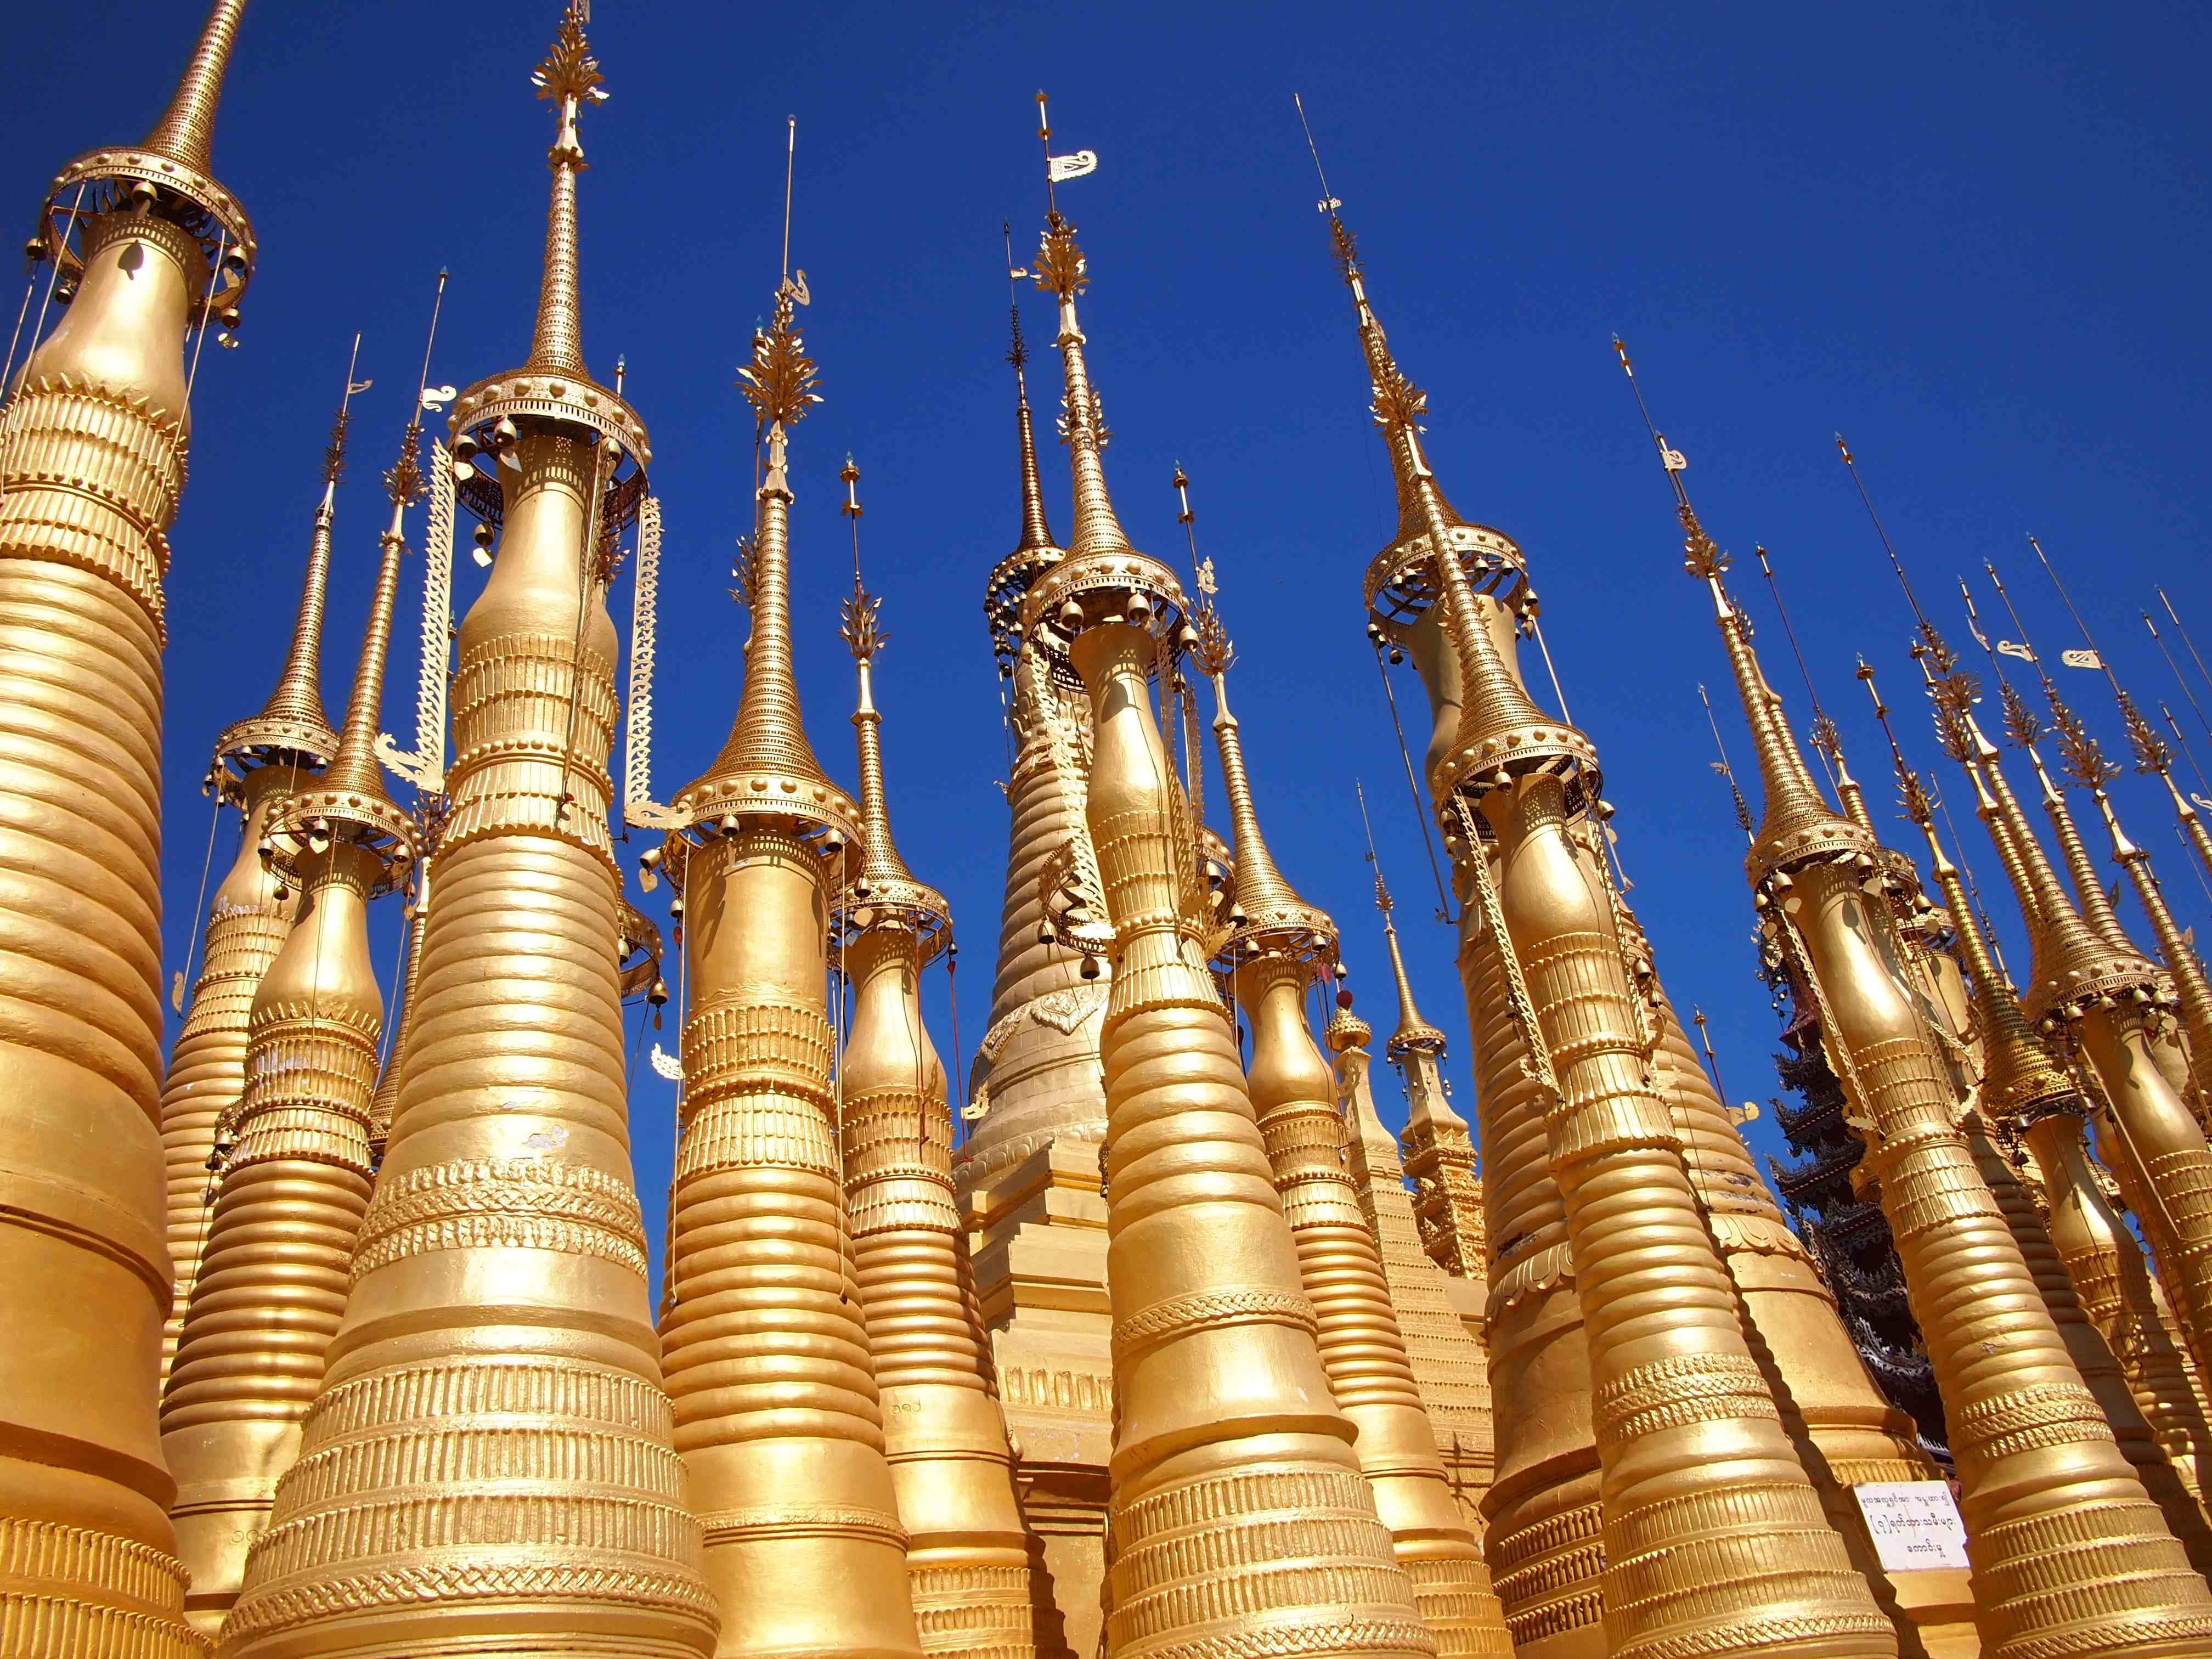 Inlay Shwe Inn Tain Pagoda